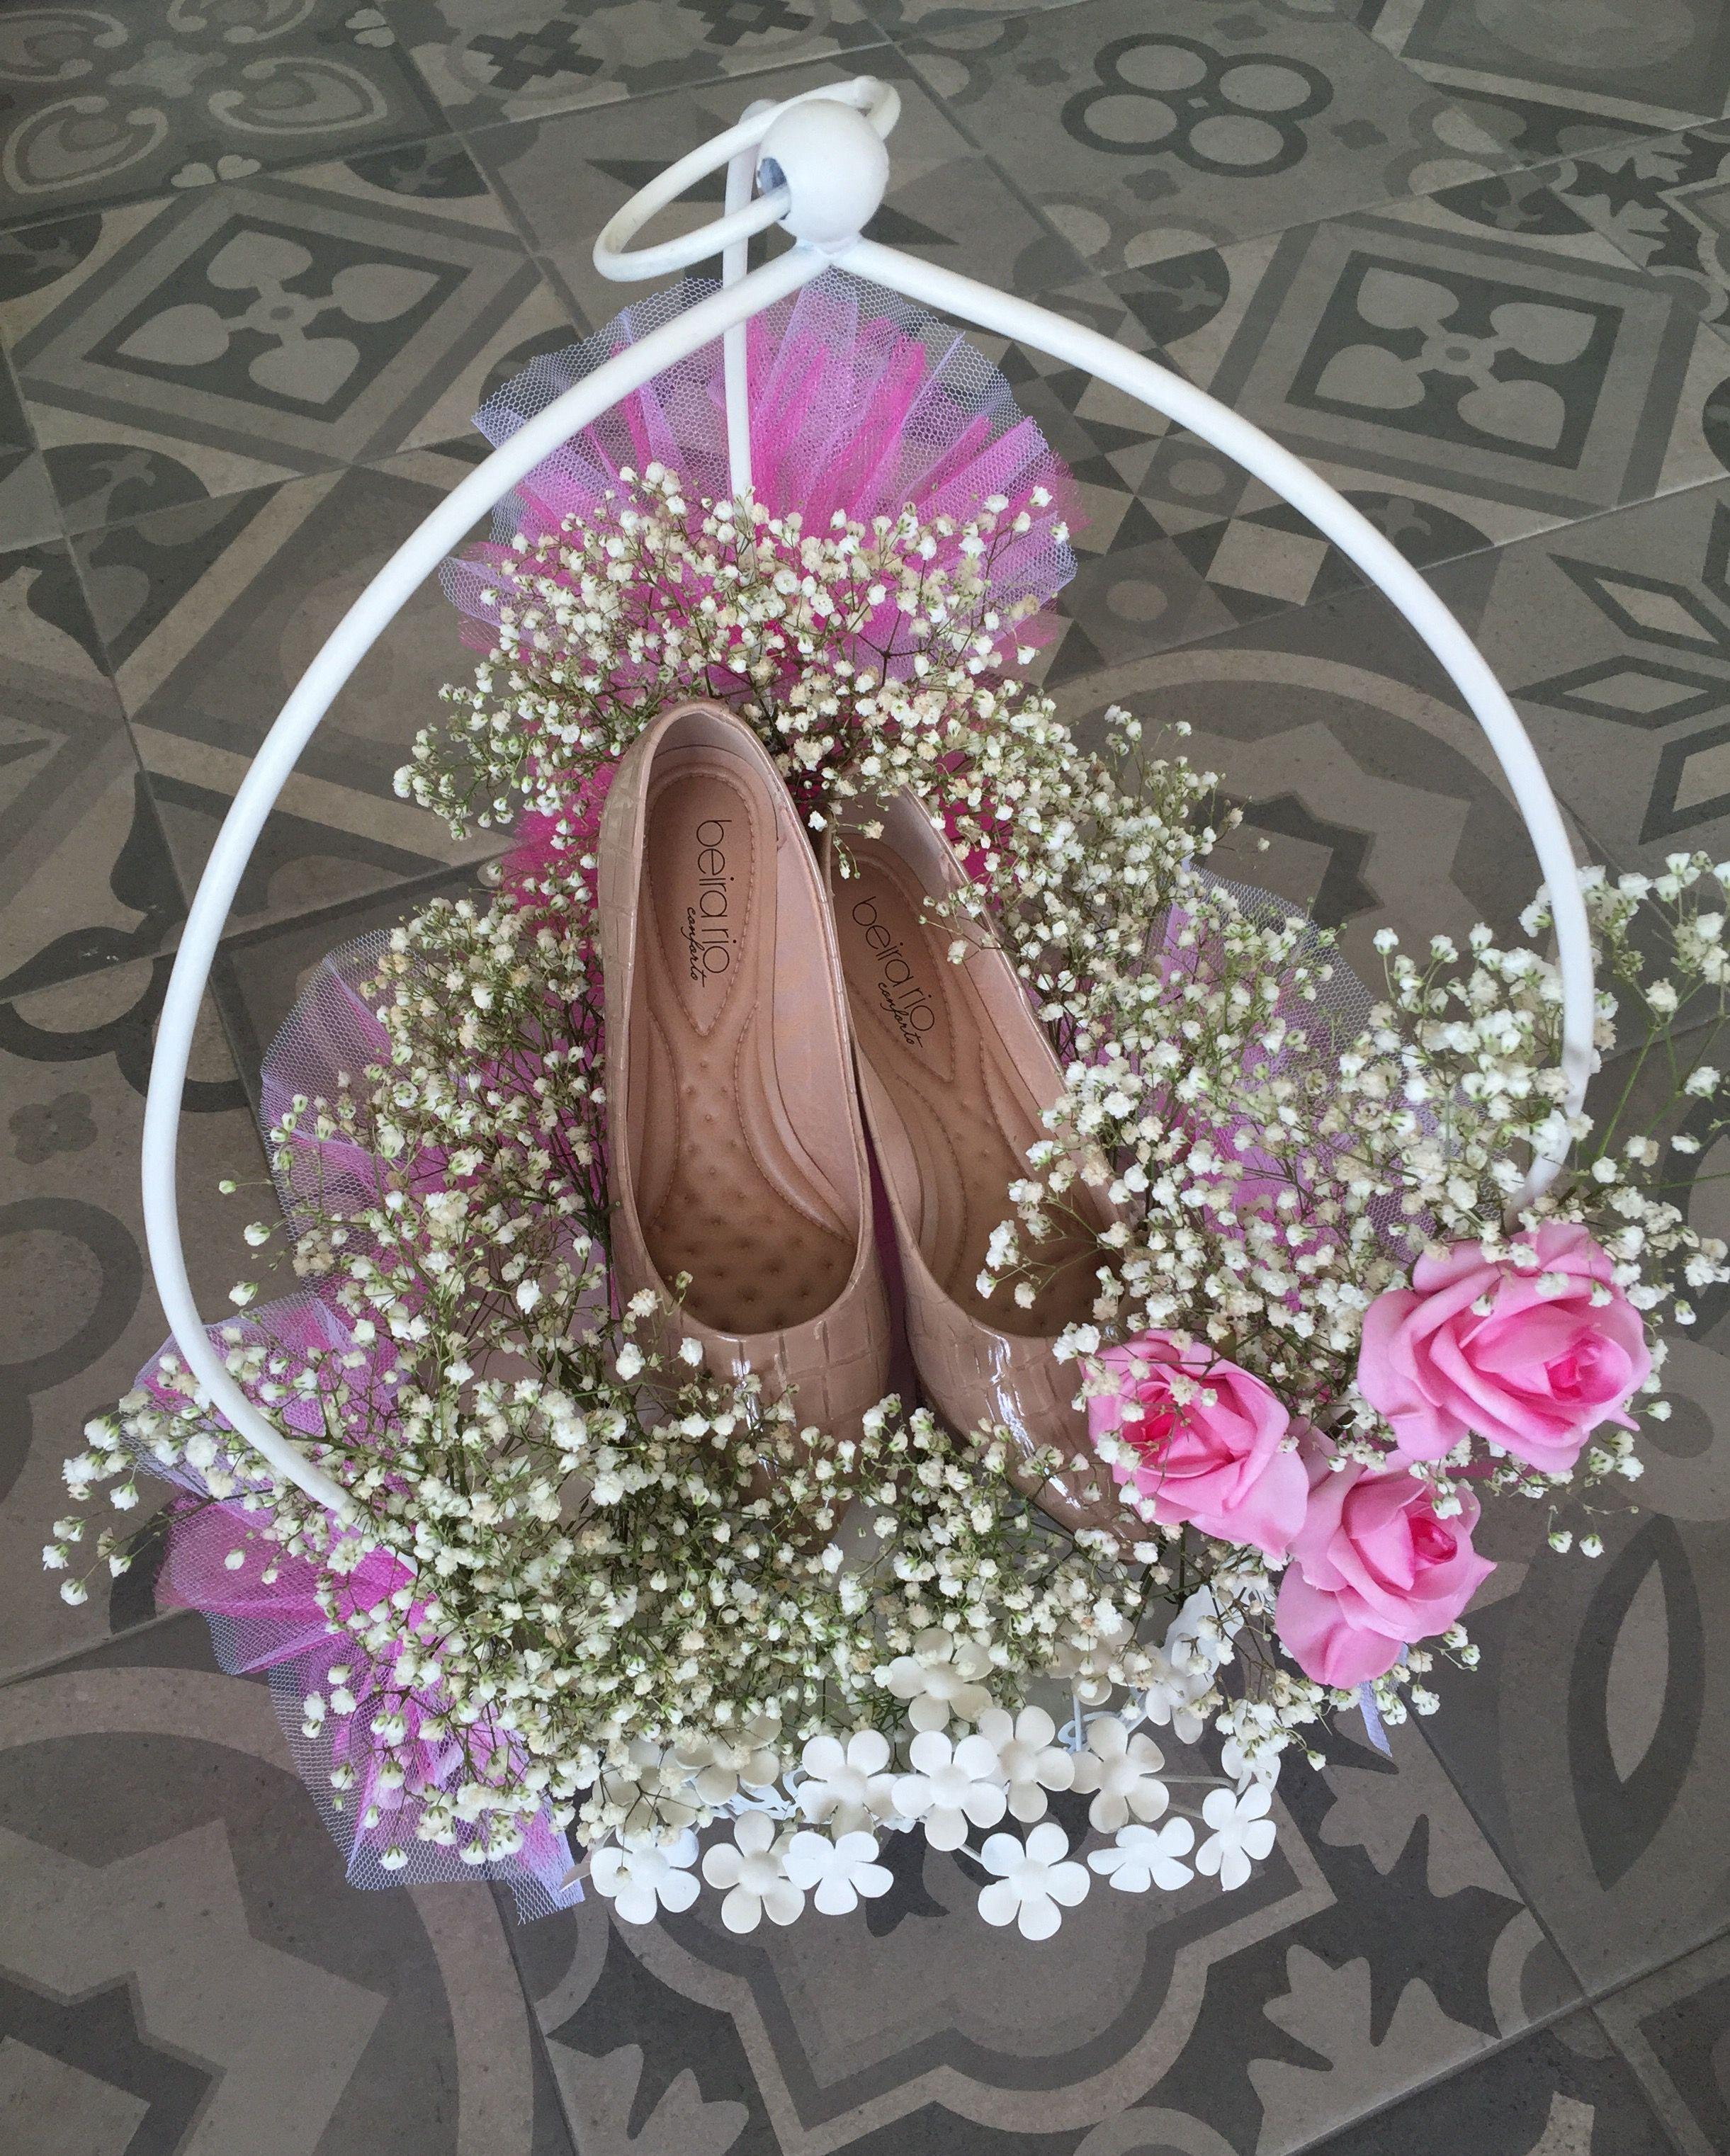 Send Wedding Gift To India: Pin By Haj On Wedding Ideas